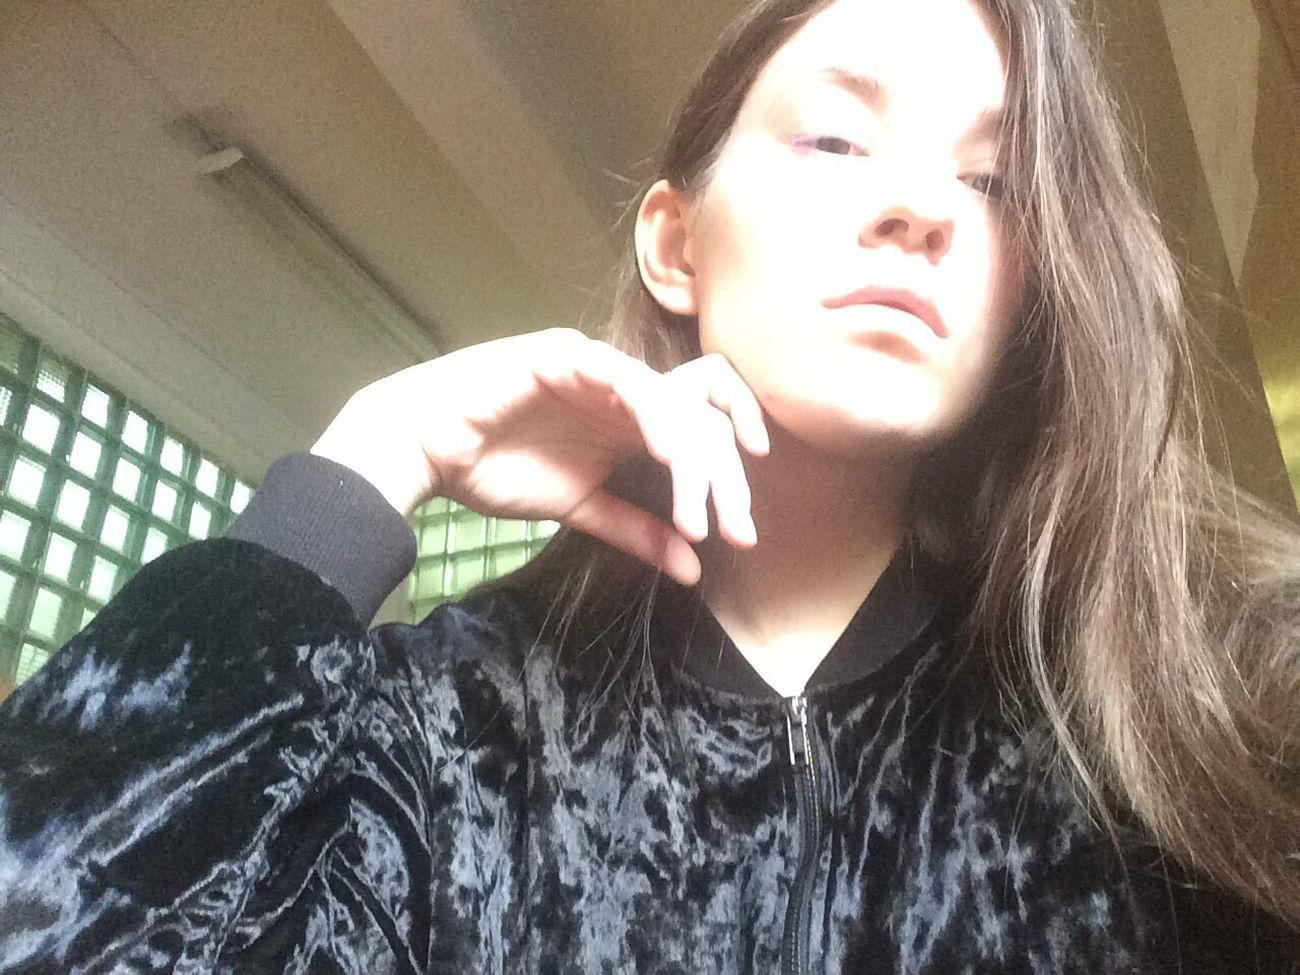 FLW ME ON INSTA @leeformat💙💙💙 Cramming Power Napping Class At A Lecture Taking Notes Studying Learning Reading Self Portrait Selfportrait Self Selfie ✌ Selfies Waiting Dreaming Dream Lion Учеба вышка Боль хочудомой хочулето хочуспать ЗаберитеМеняНаМоре семинар